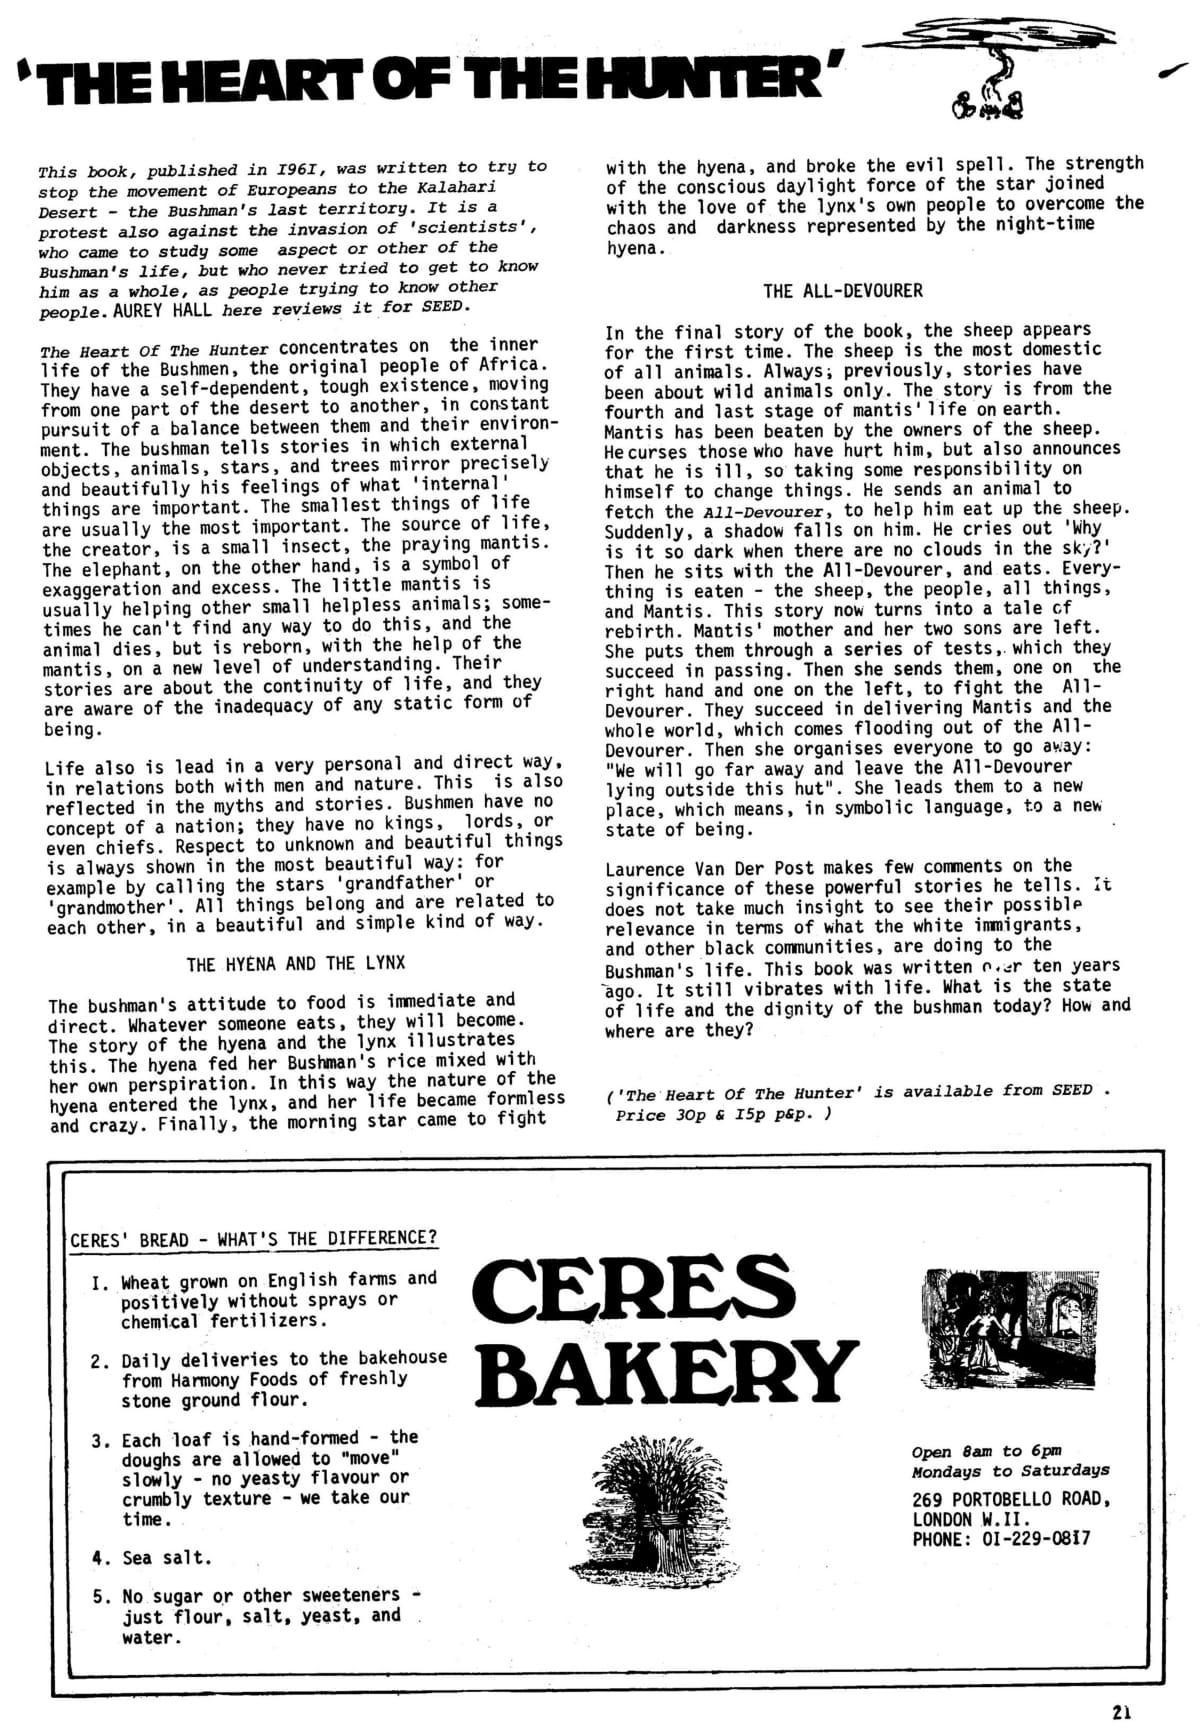 seed-v2-n10-oct1973-28.jpg